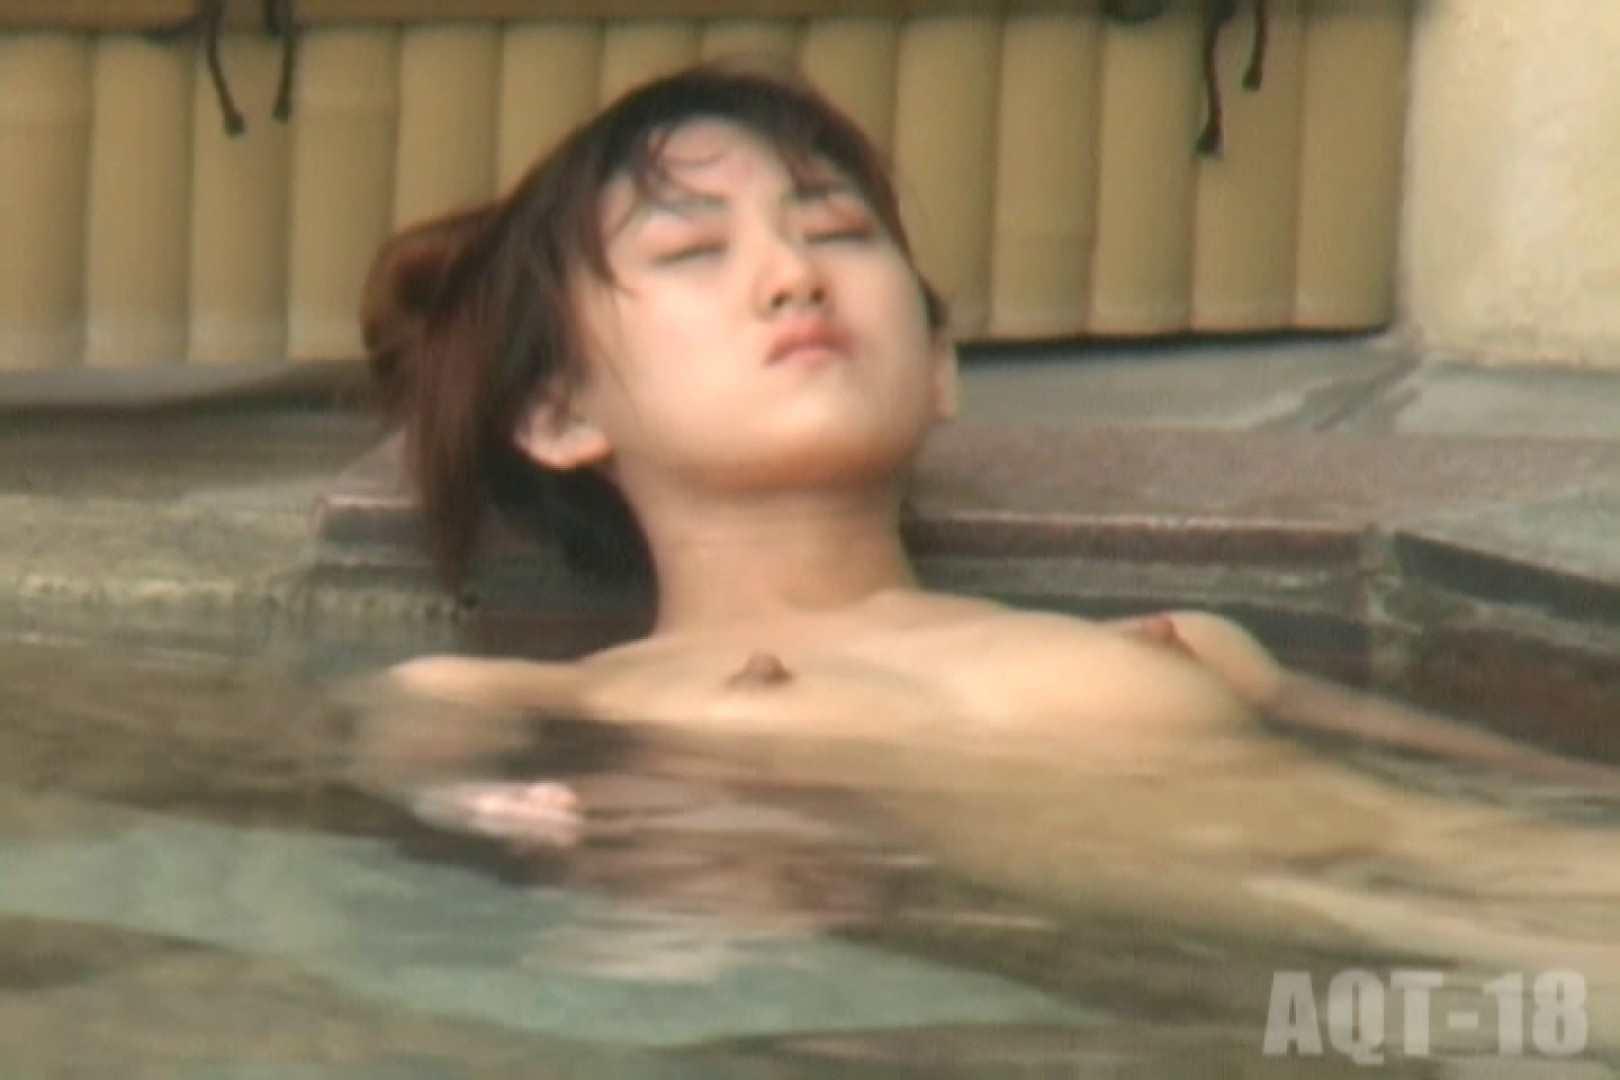 Aquaな露天風呂Vol.862 美しいOLの裸体 戯れ無修正画像 99pic 29